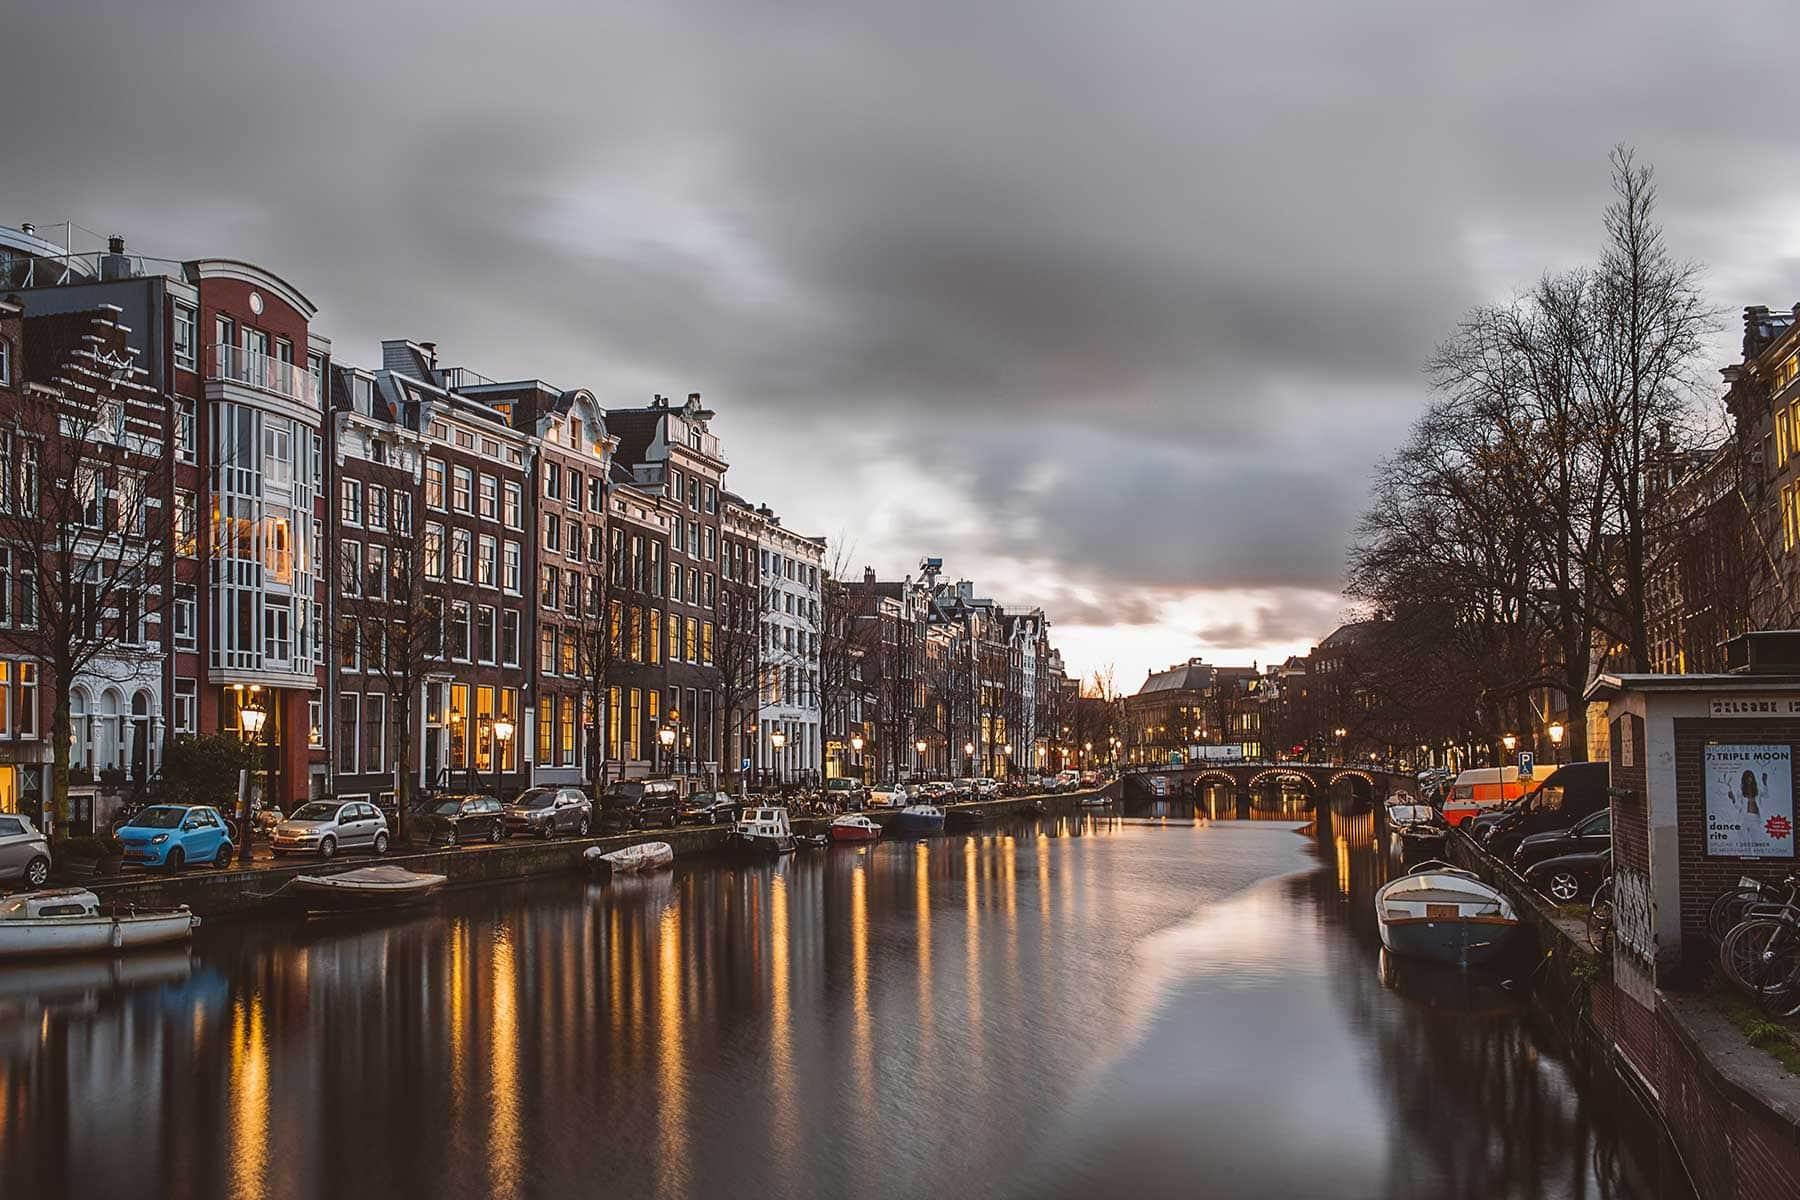 Resor-till-Amsterdam-med-Nygren-Lind-Resebyrå---kanaler